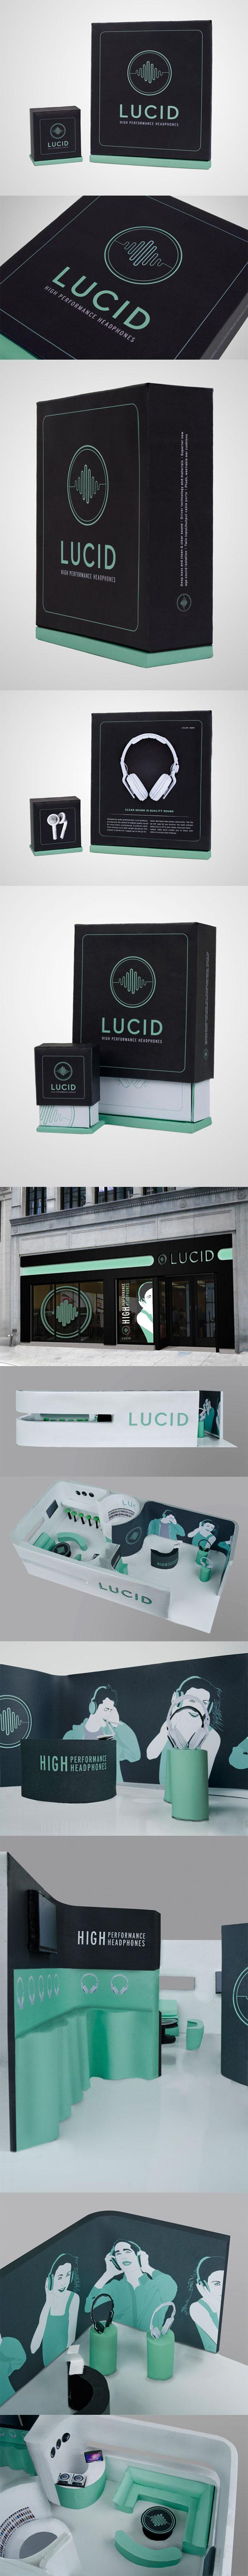 Lucid via Behance #packaging #branding #marketing PD